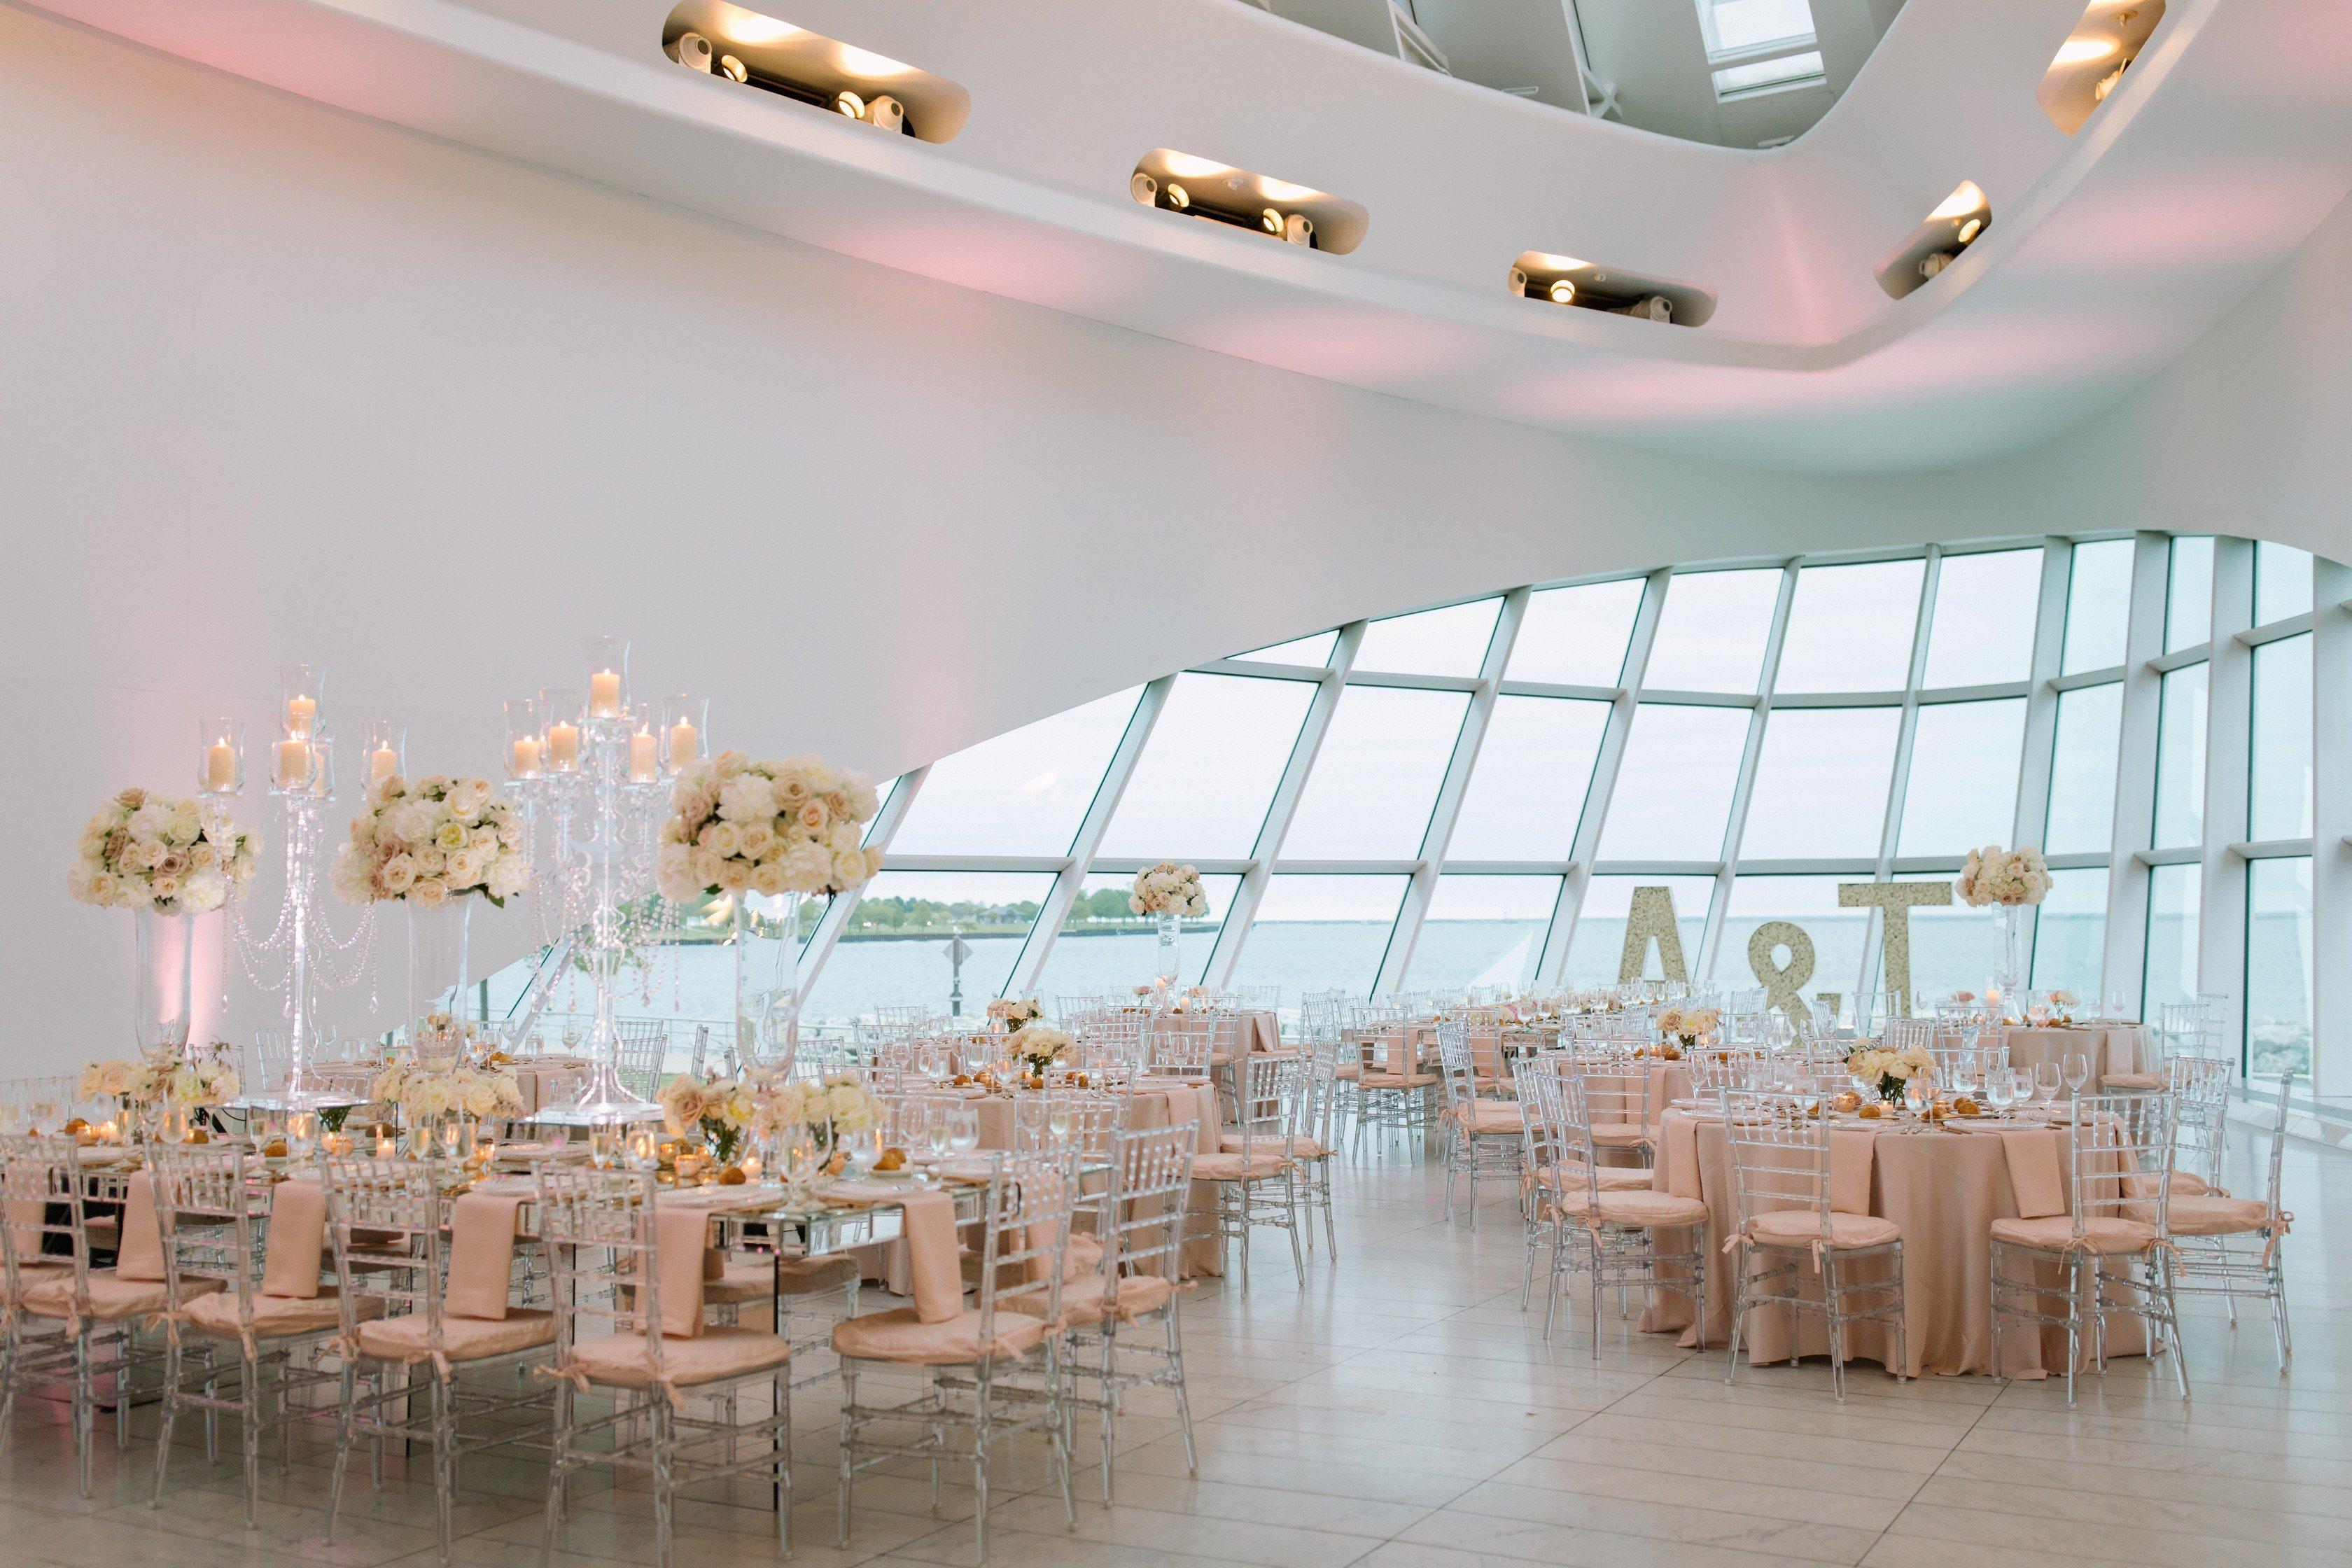 Milwaukee Art Museum The Most Exclusive Wedding Venue In Milwaukee Yanni Design Studio